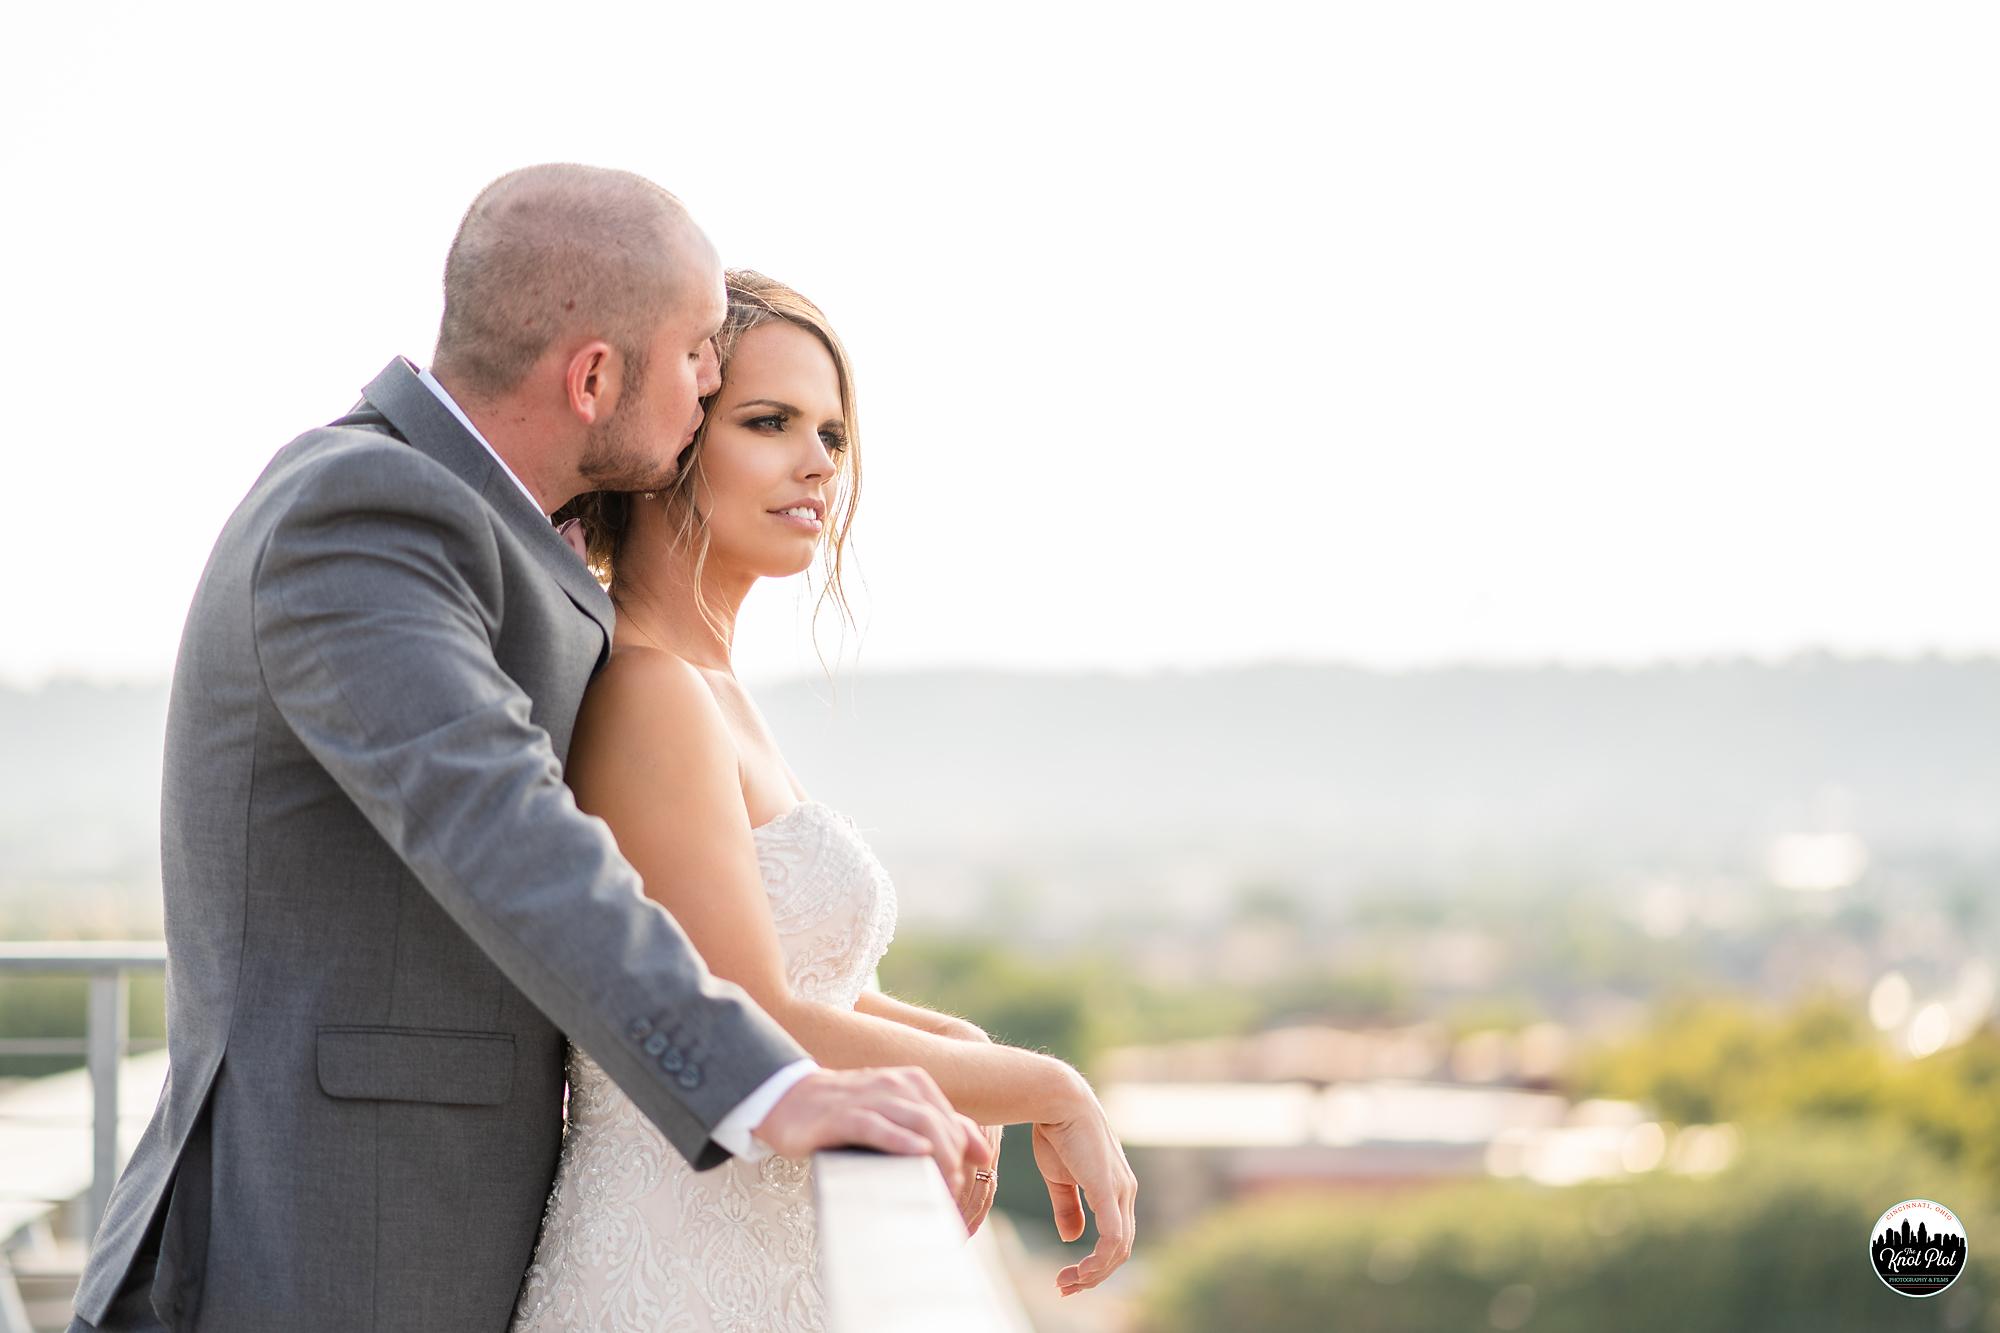 Strietmann-Penthaus-OTR-Cincinnati-Wedding-Photography-17.jpg